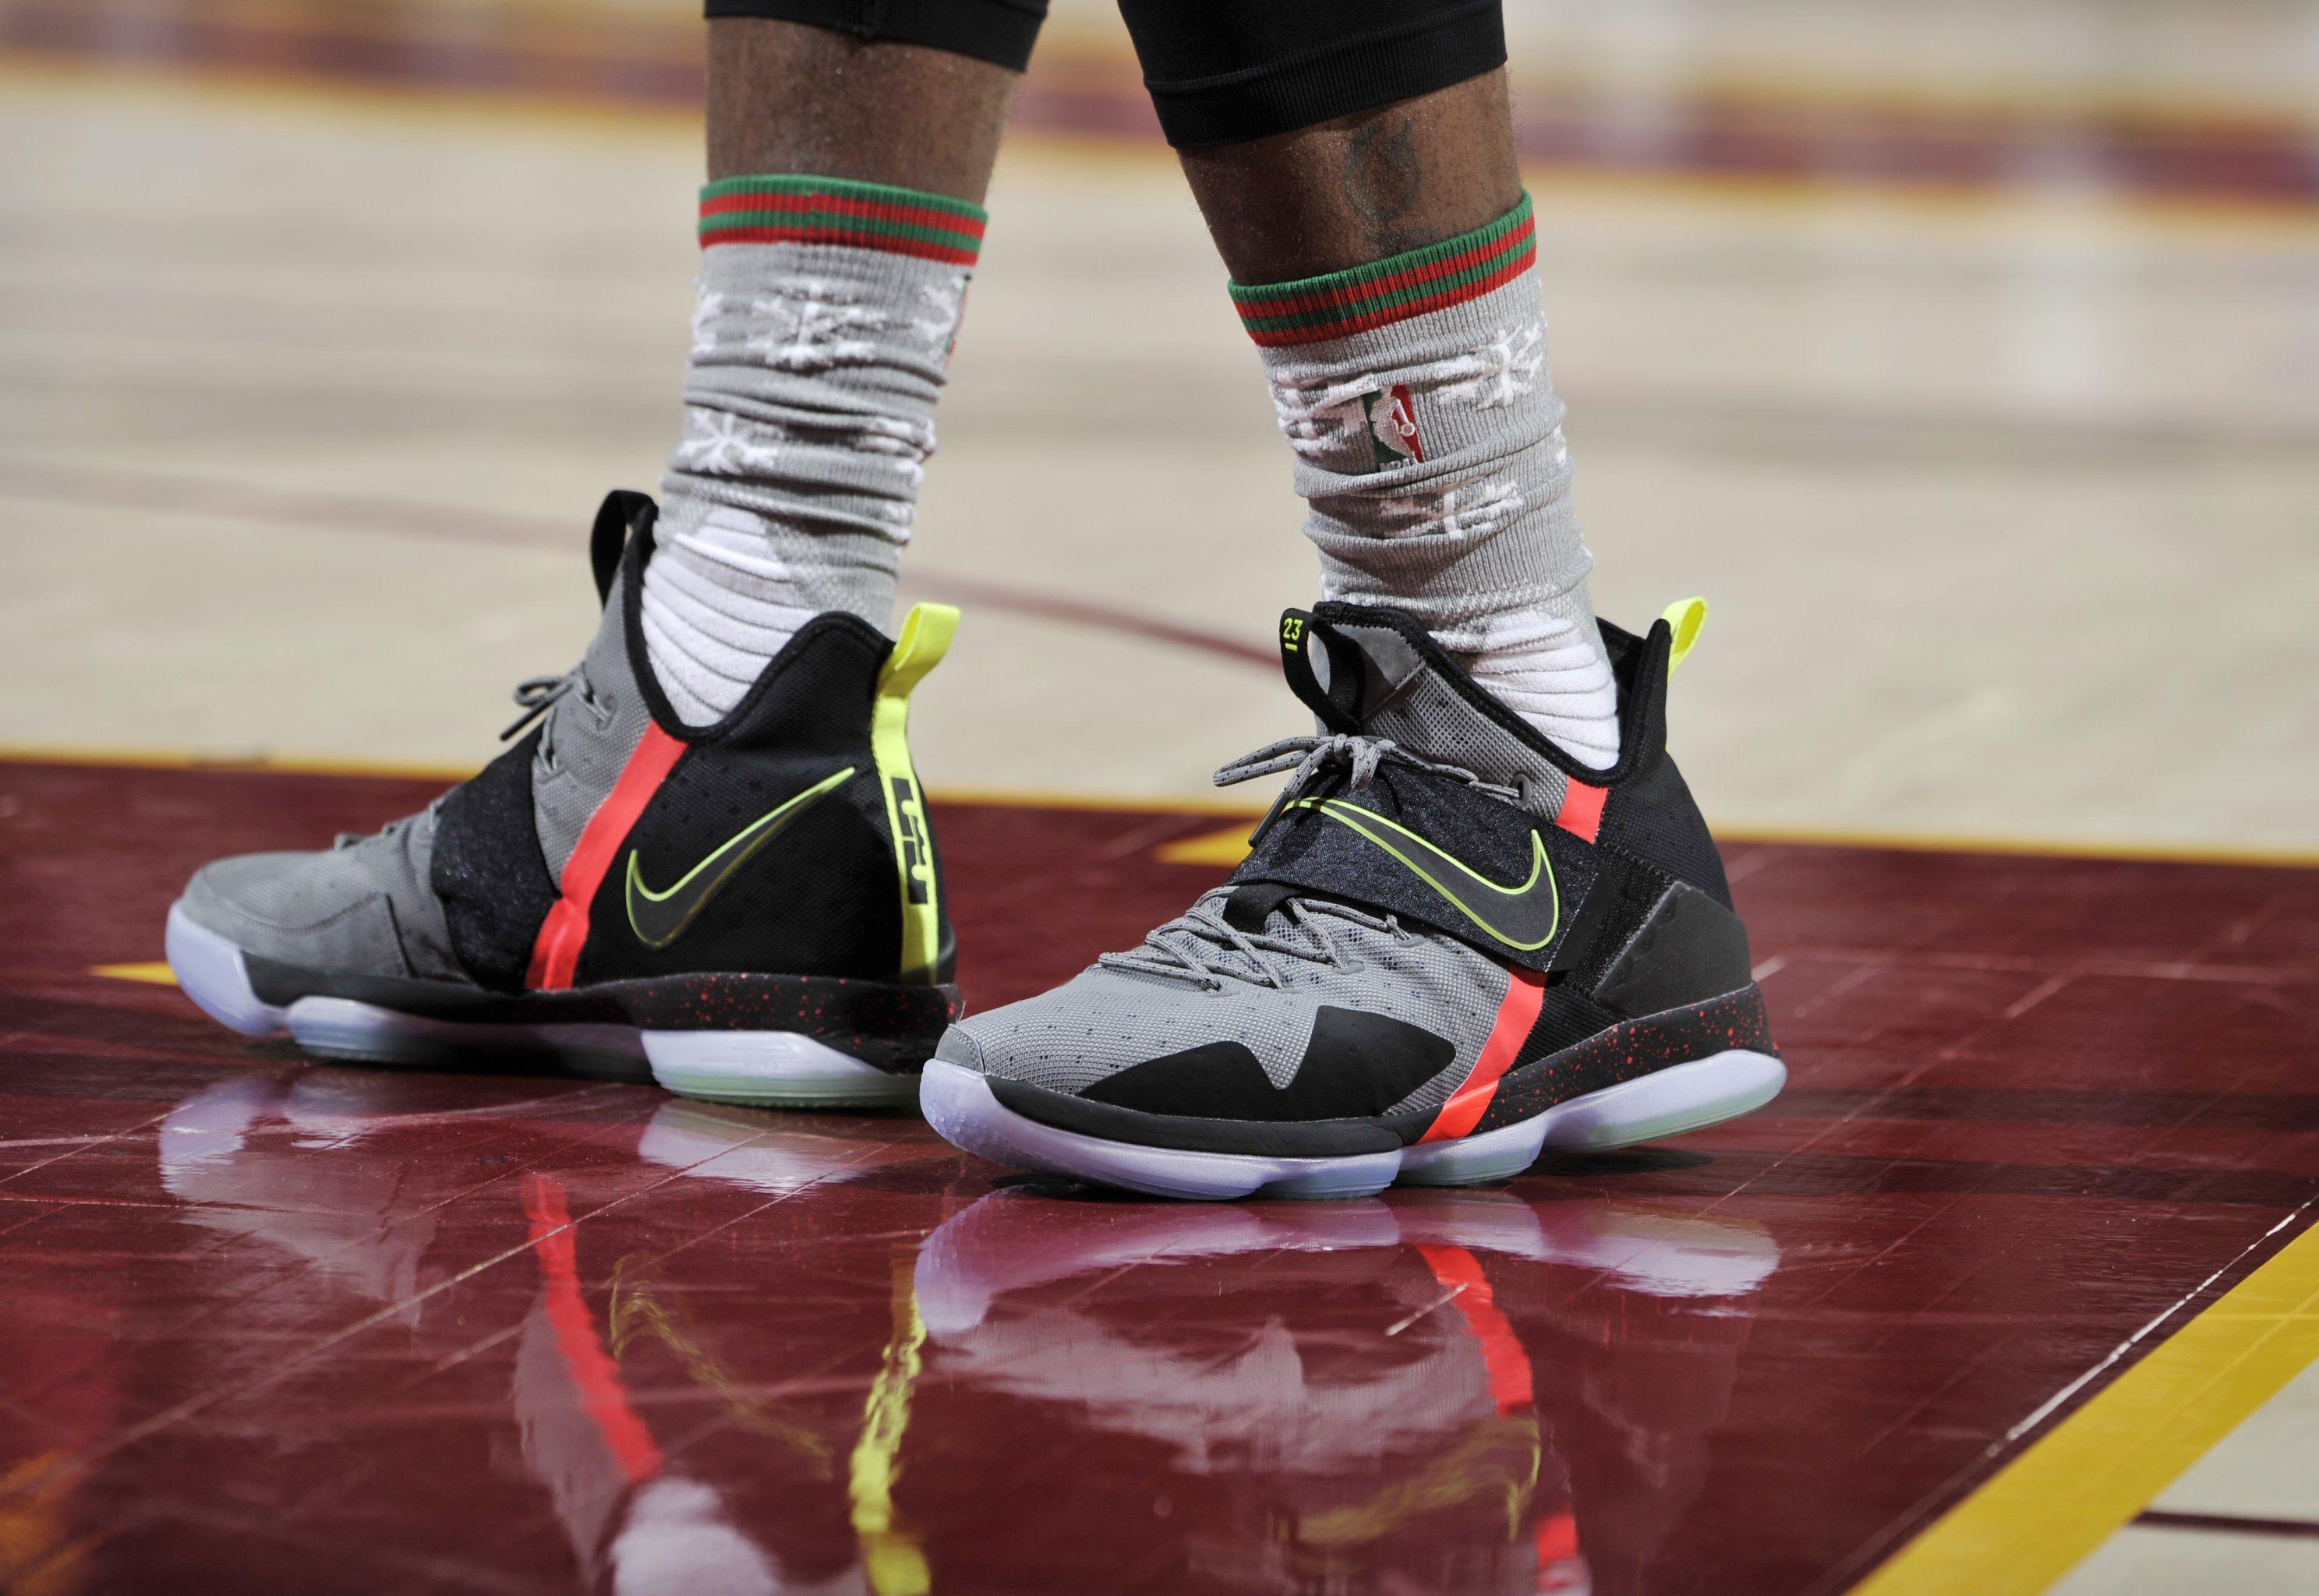 Derrick Rose Christmas Shoes 2016.Christmas Day Shoes 2016 Top Kicks On Court Bleacher